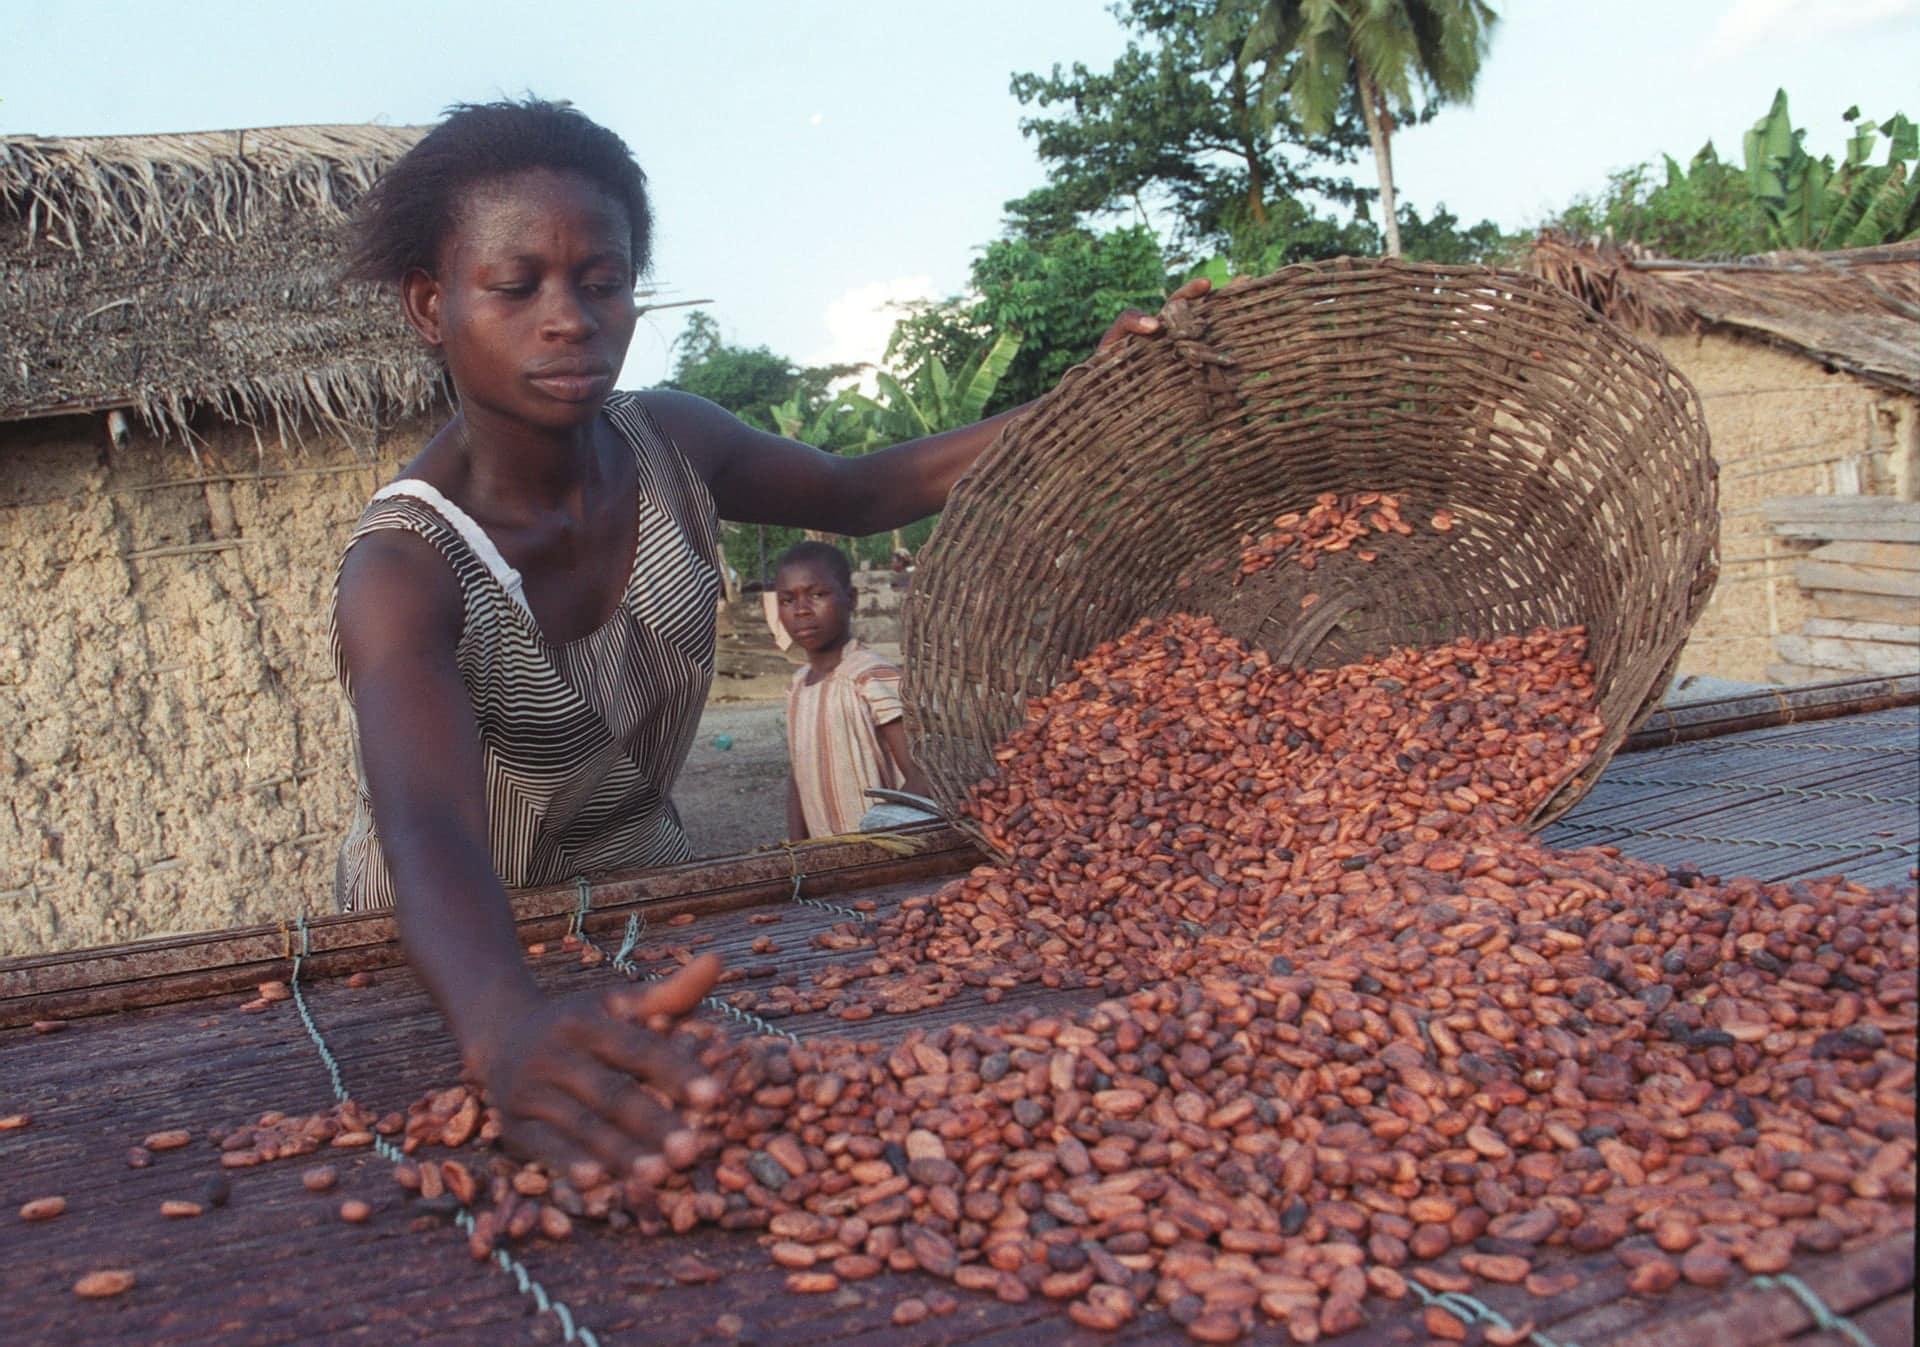 Izzivi za pravično trgovino?